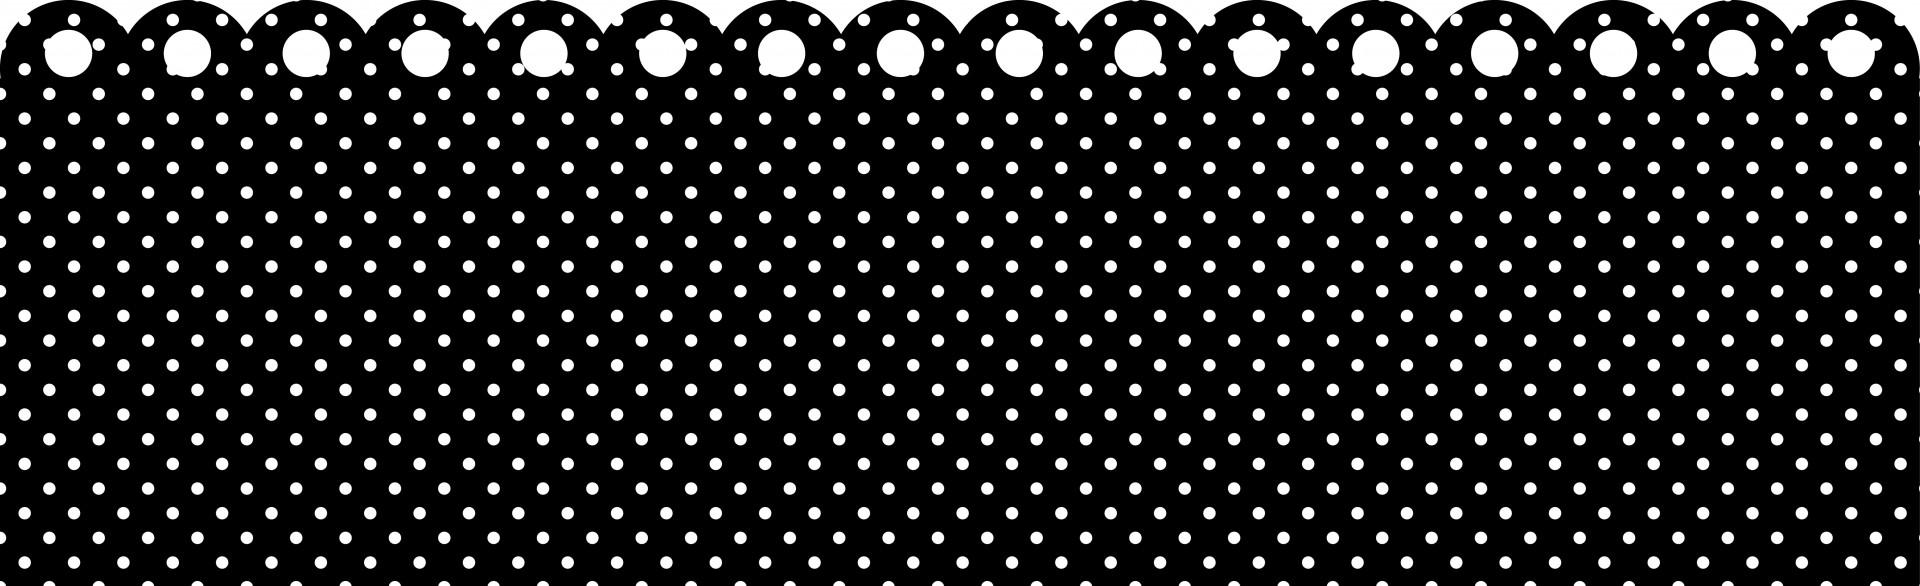 Polka Dots Dots Spots Black White Free Photo From Needpix Com